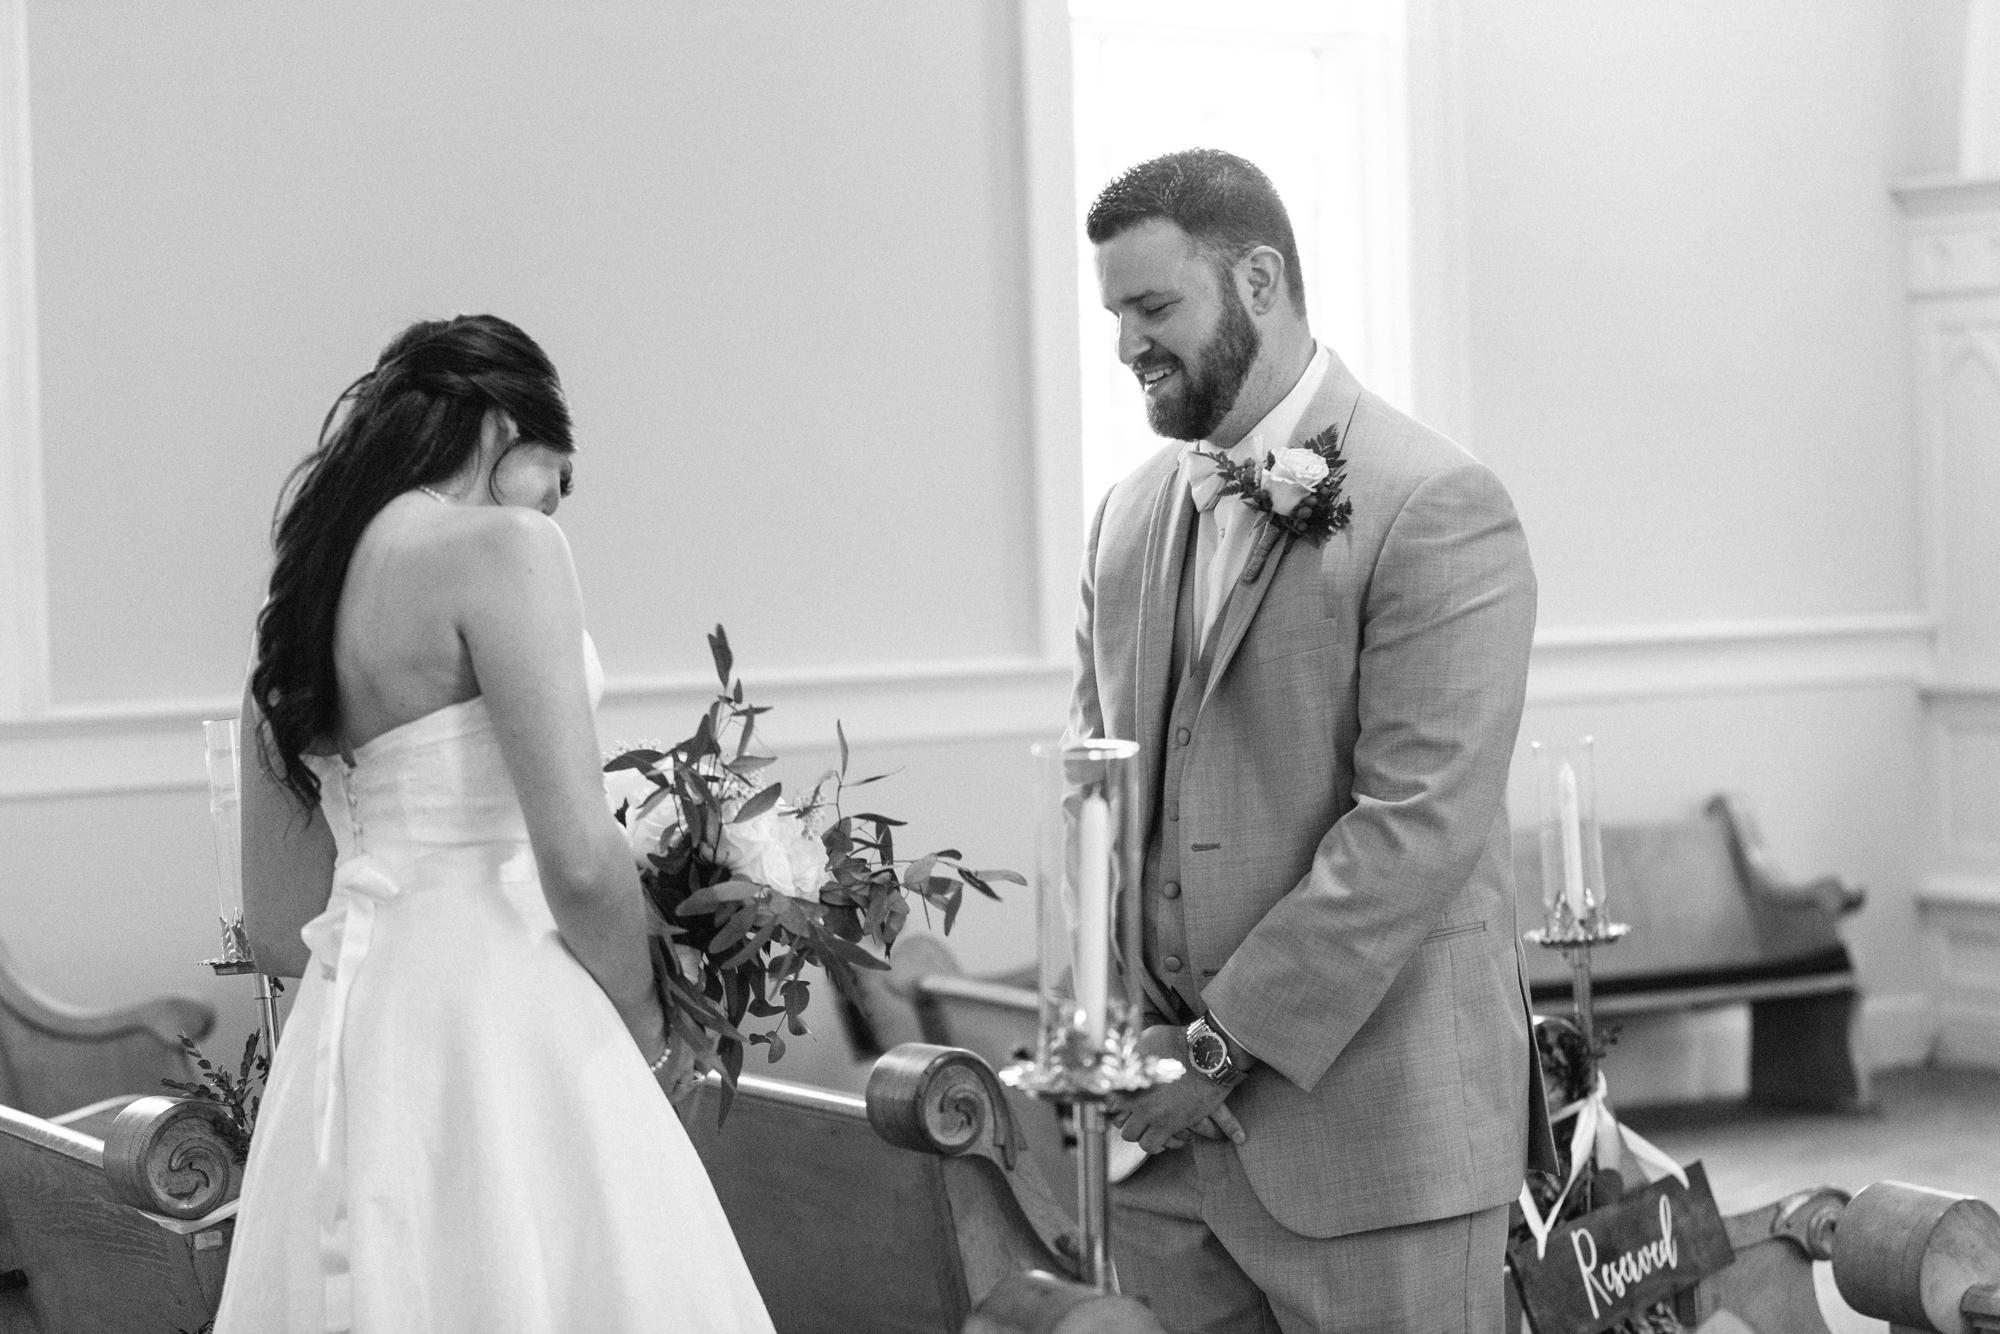 New_Orleans_Wedding_Photographer_1238.jpg